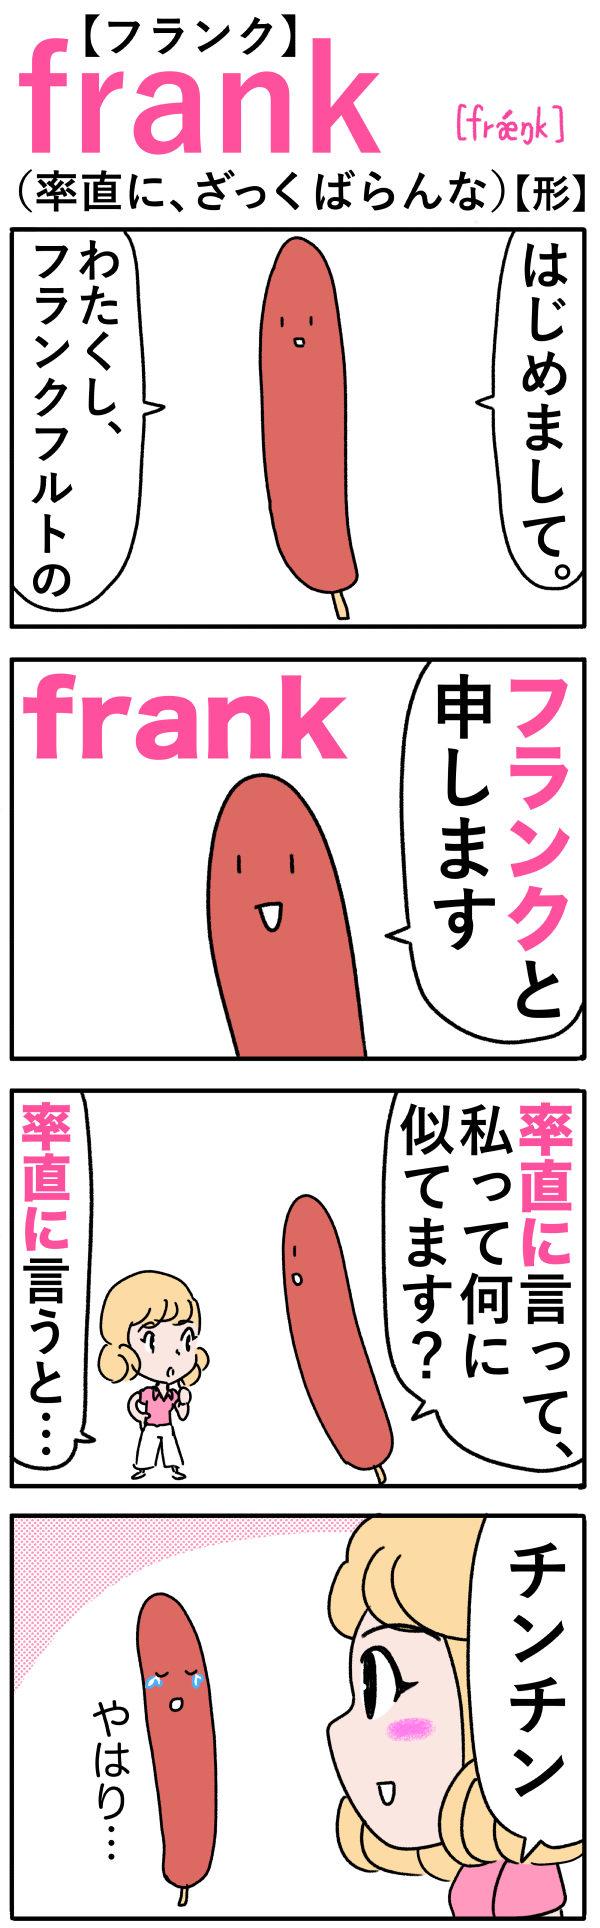 frank(率直に)の語呂合わせ英単語